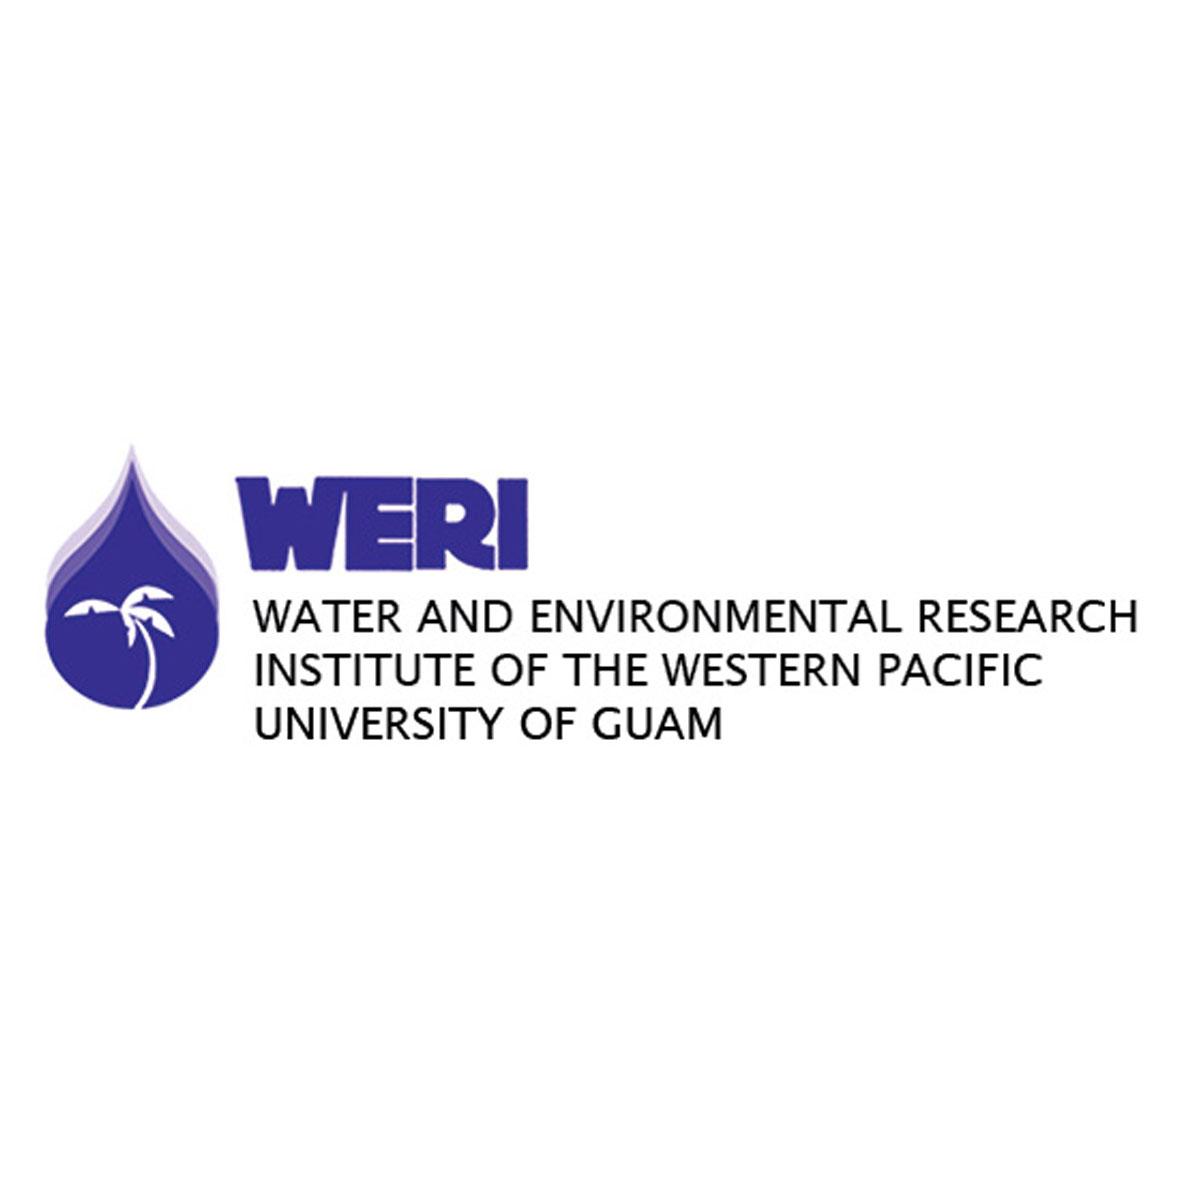 weri logo graphic